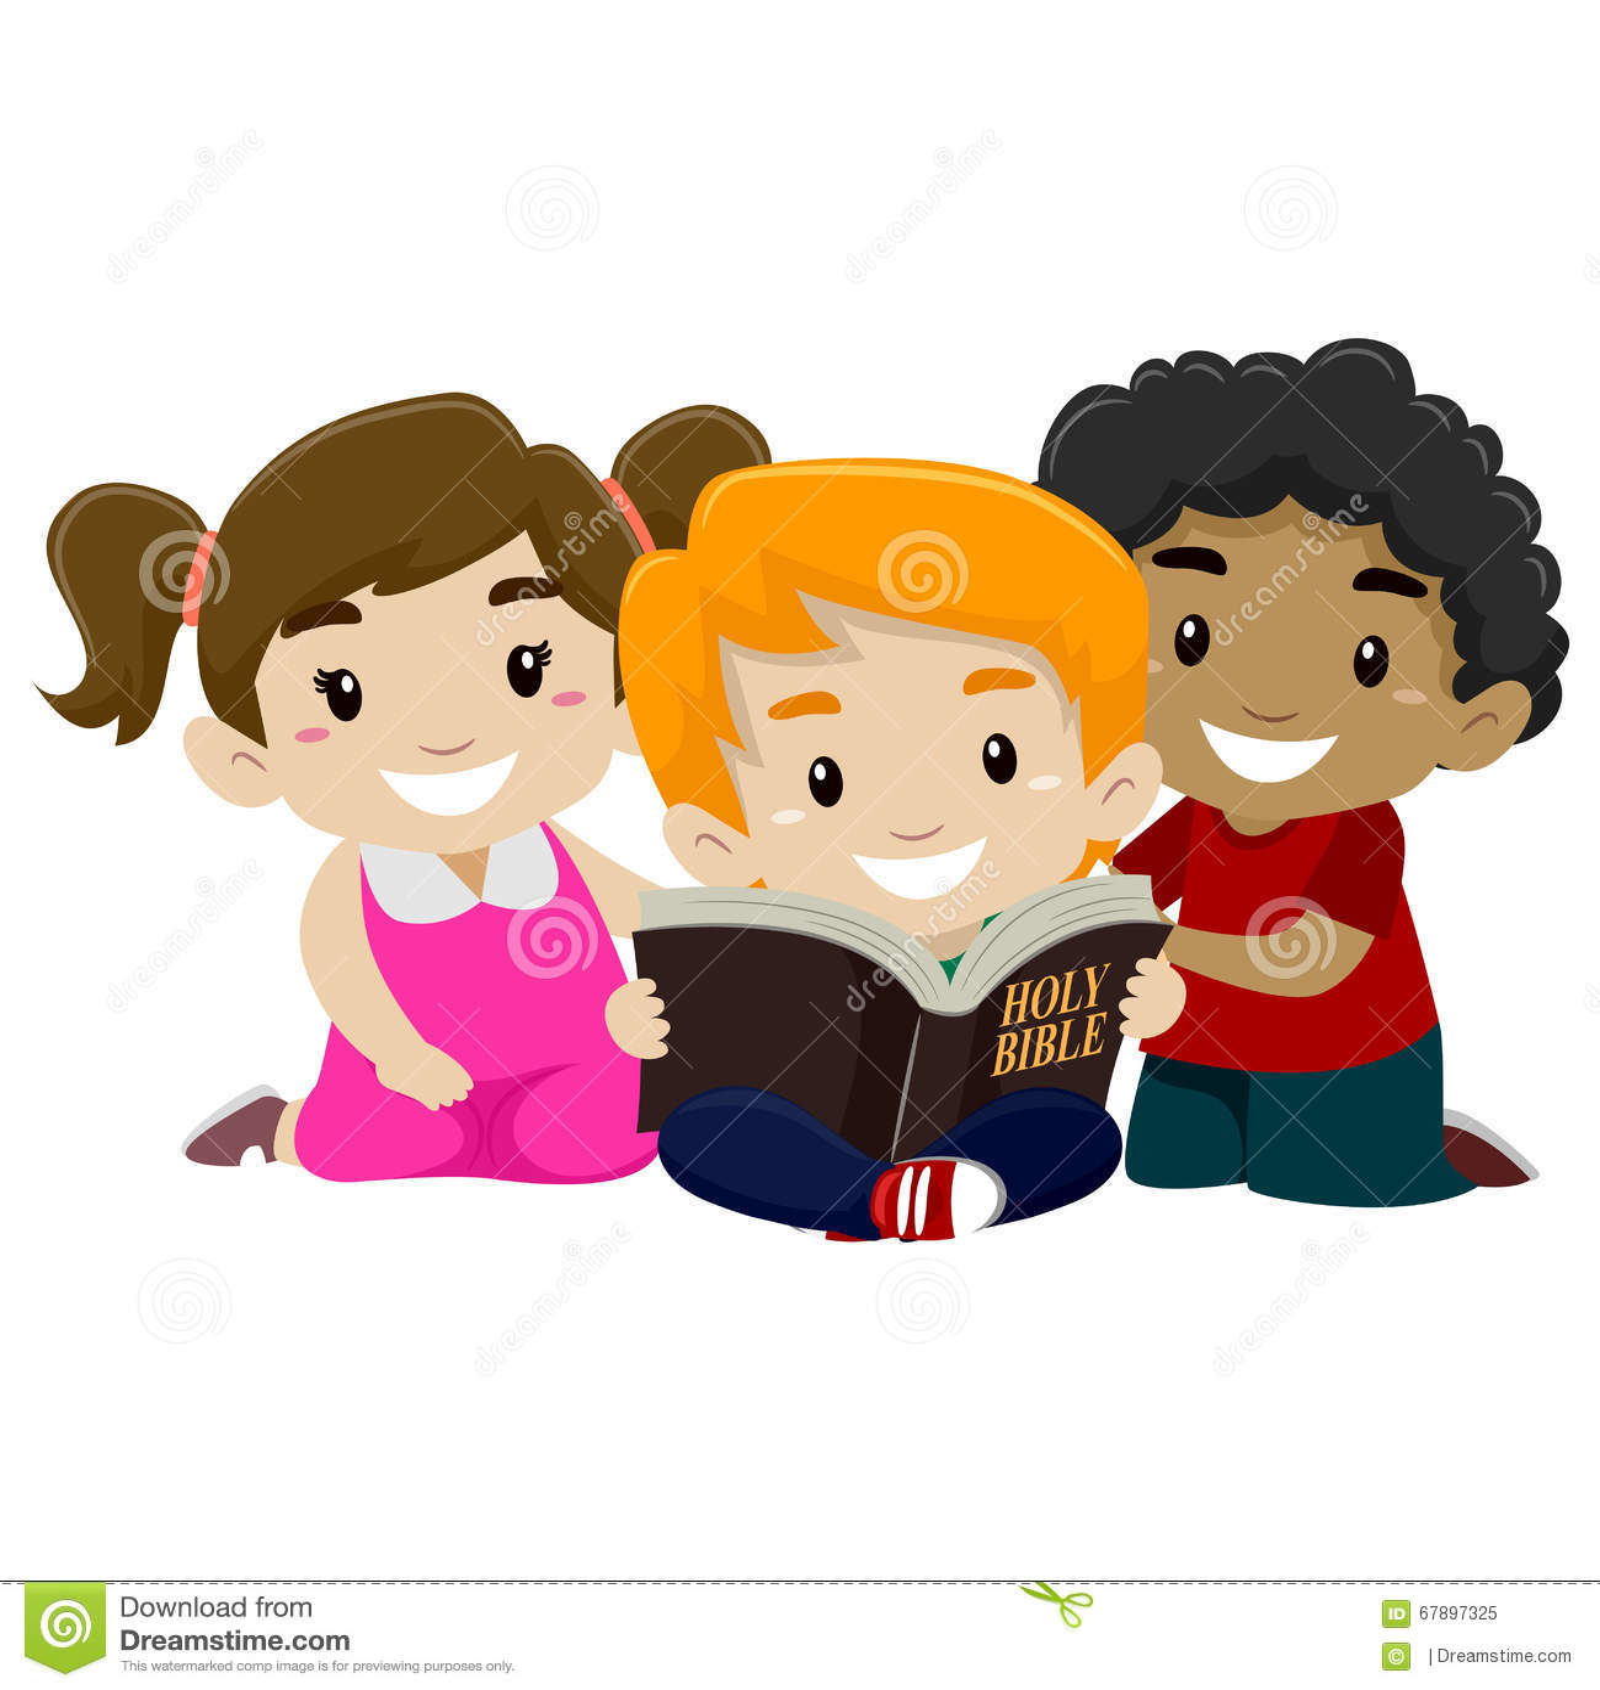 Stock Illustration Children Reading Bible Vector Illustration Image67897325 on 3d Floor Plan